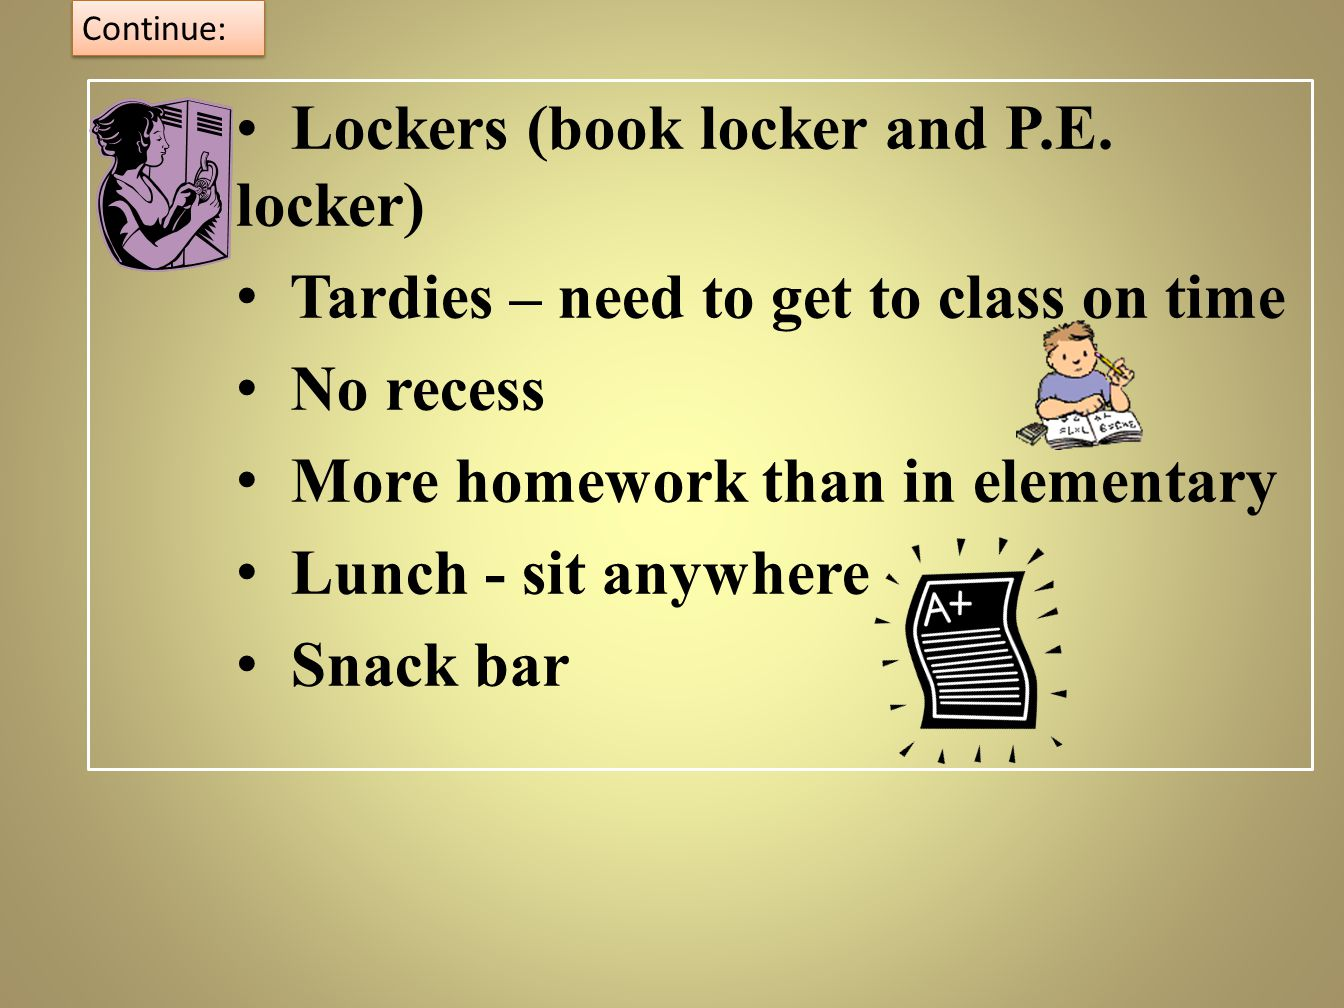 Lockers (book locker and P.E. locker)